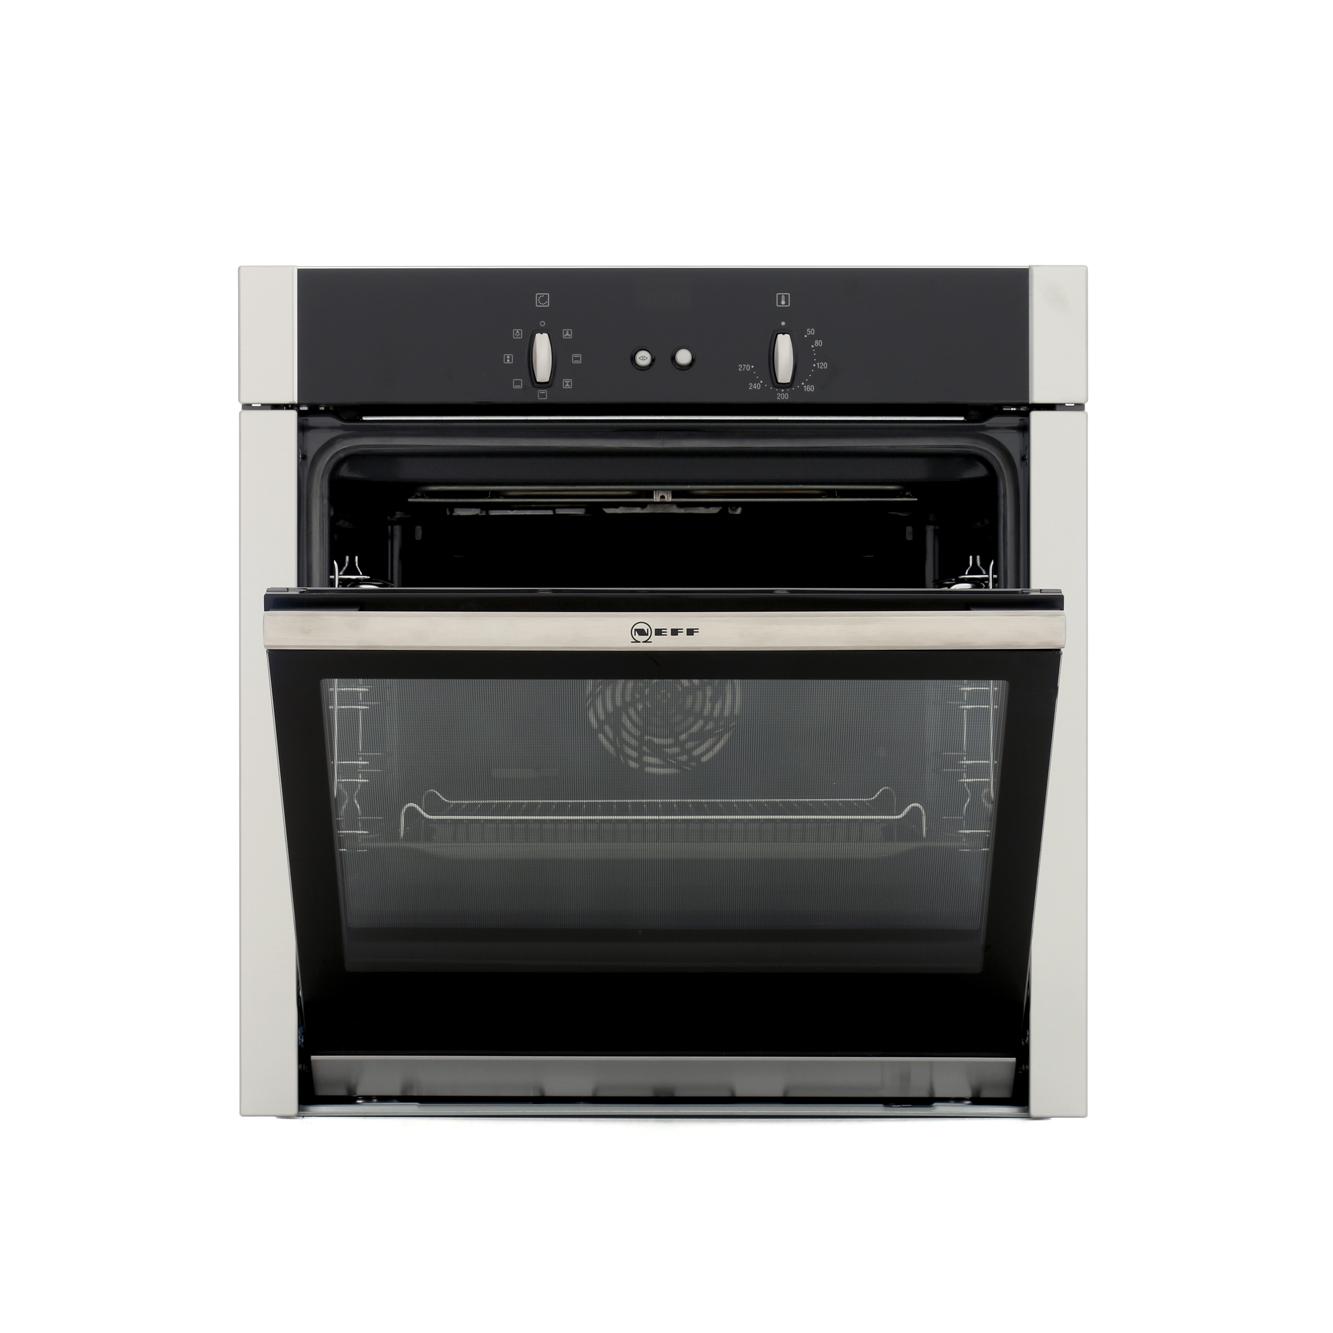 neff b44m42n5gb built in 60cm hide slide electric single oven stainless steel affordable. Black Bedroom Furniture Sets. Home Design Ideas